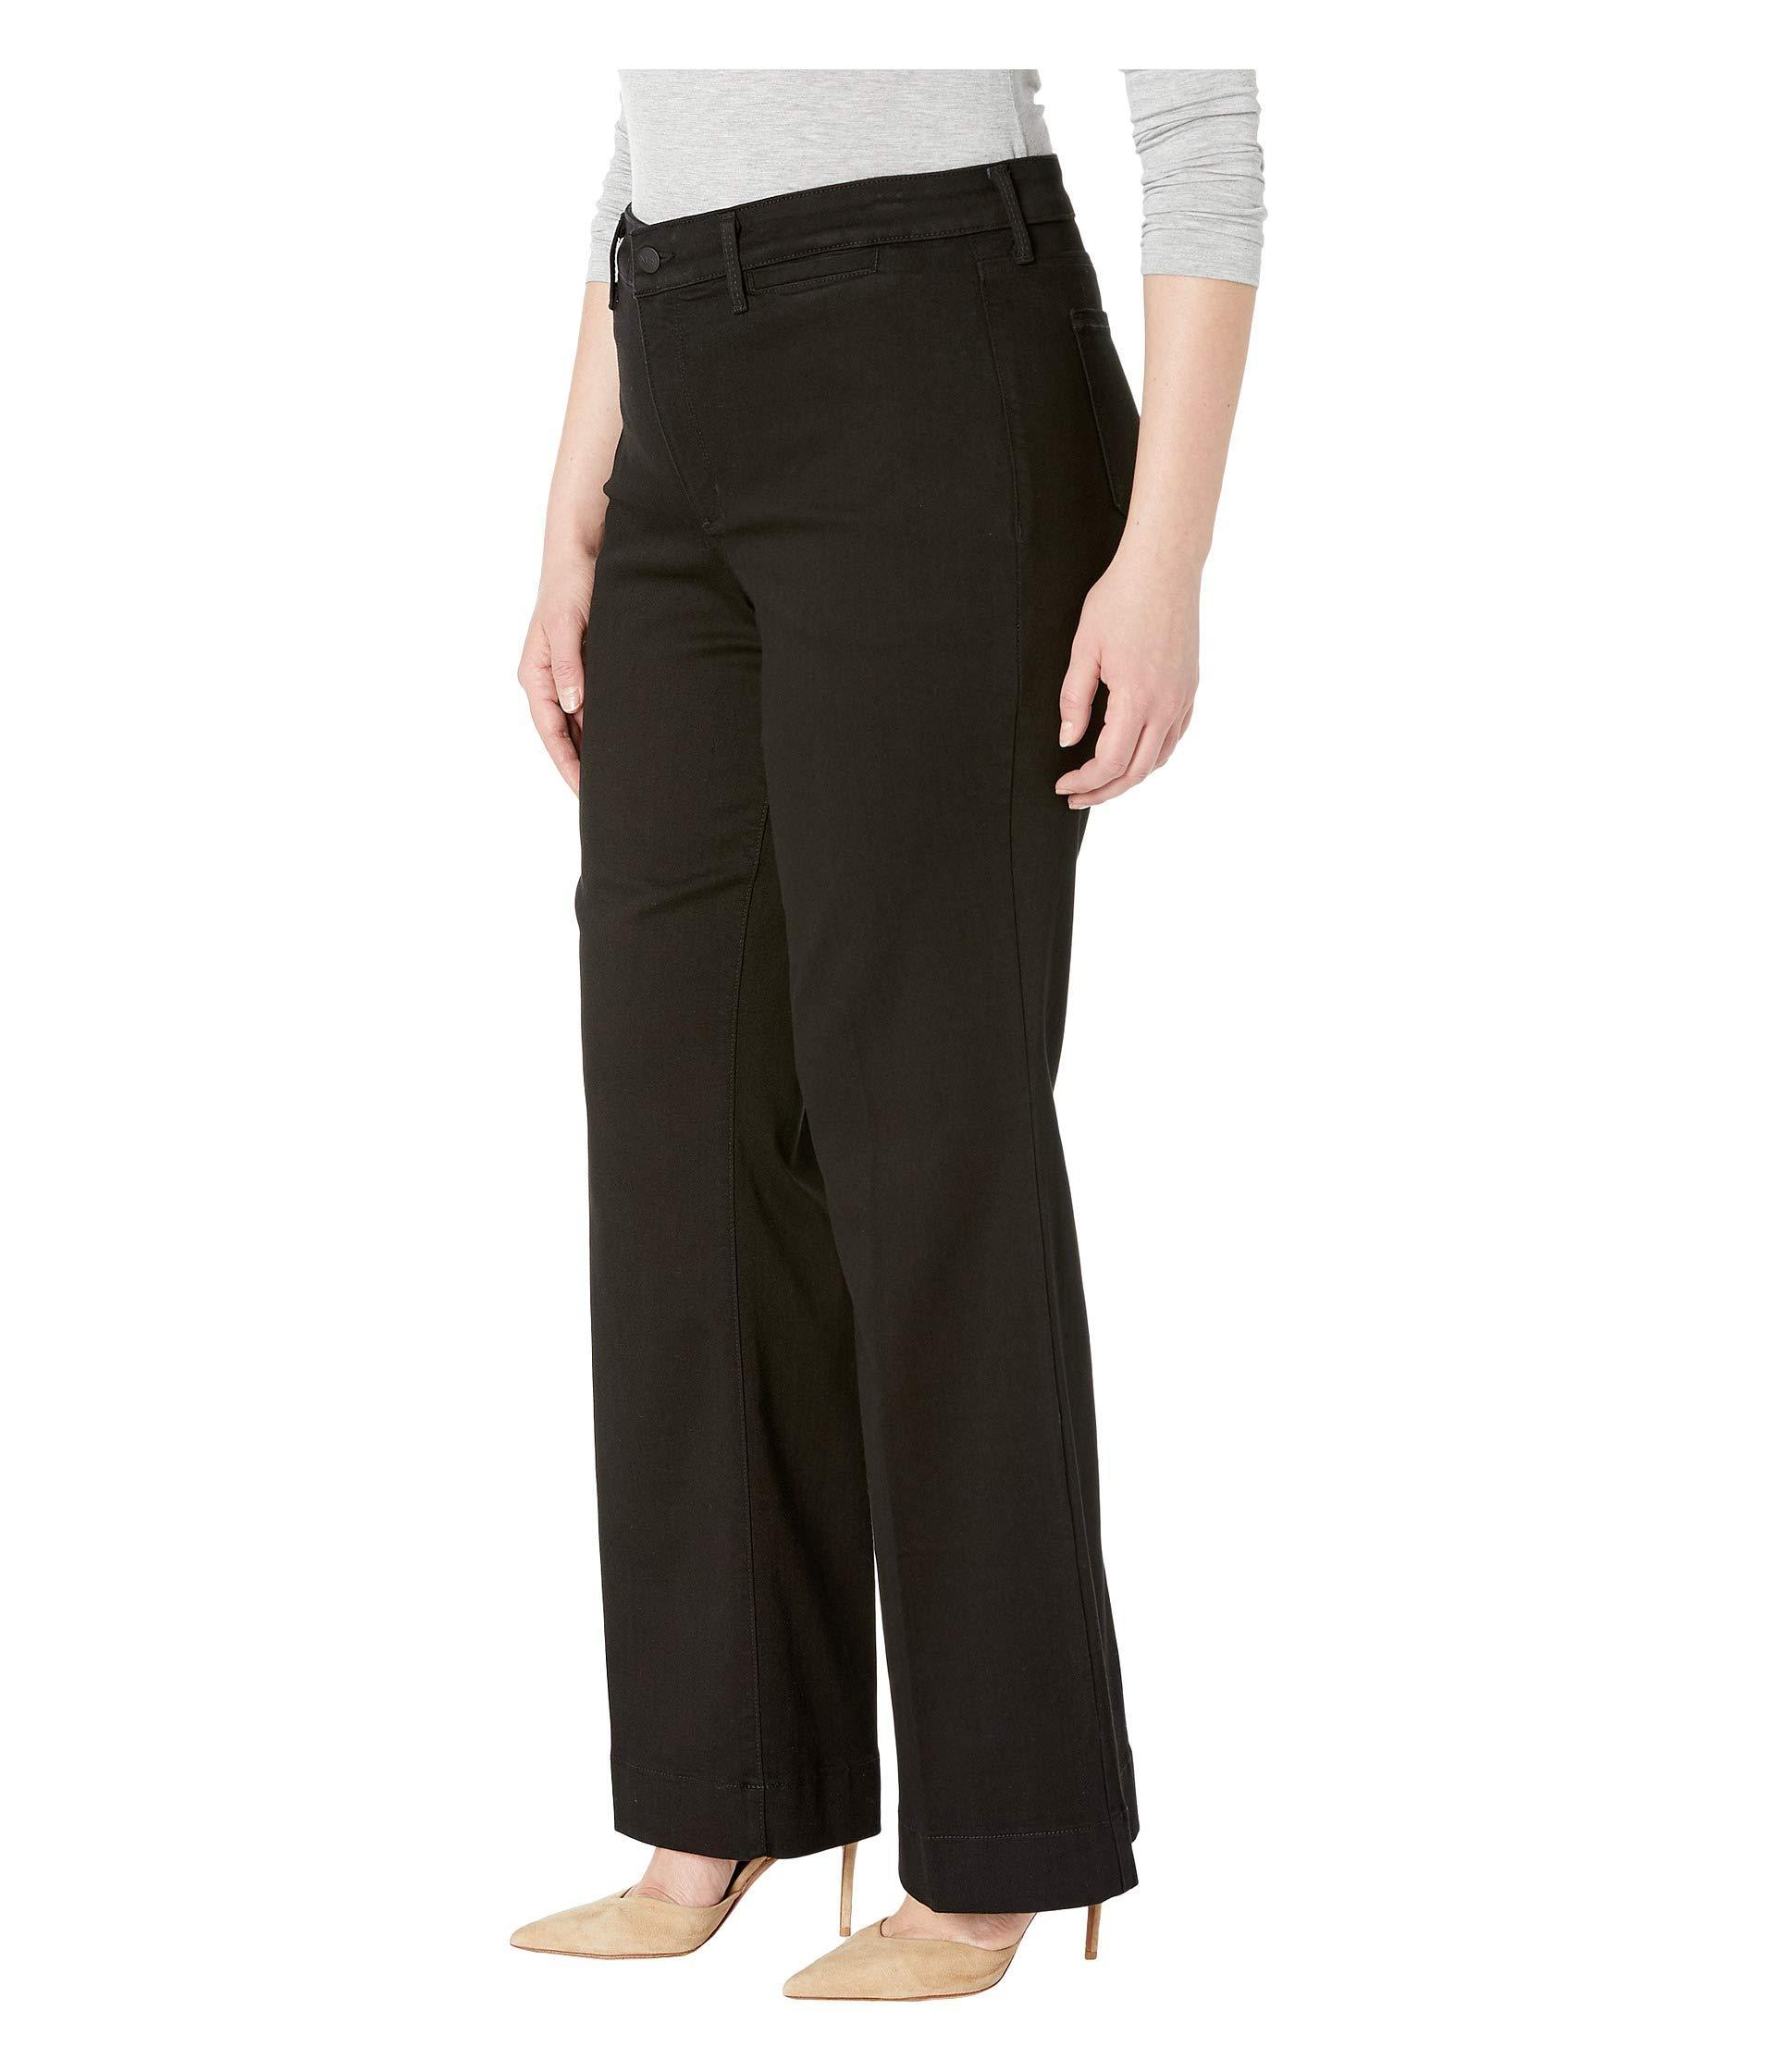 bf65cacb906a0 Lyst - NYDJ Plus Size Teresa Trousers In Black (black) Women s Jeans in  Black